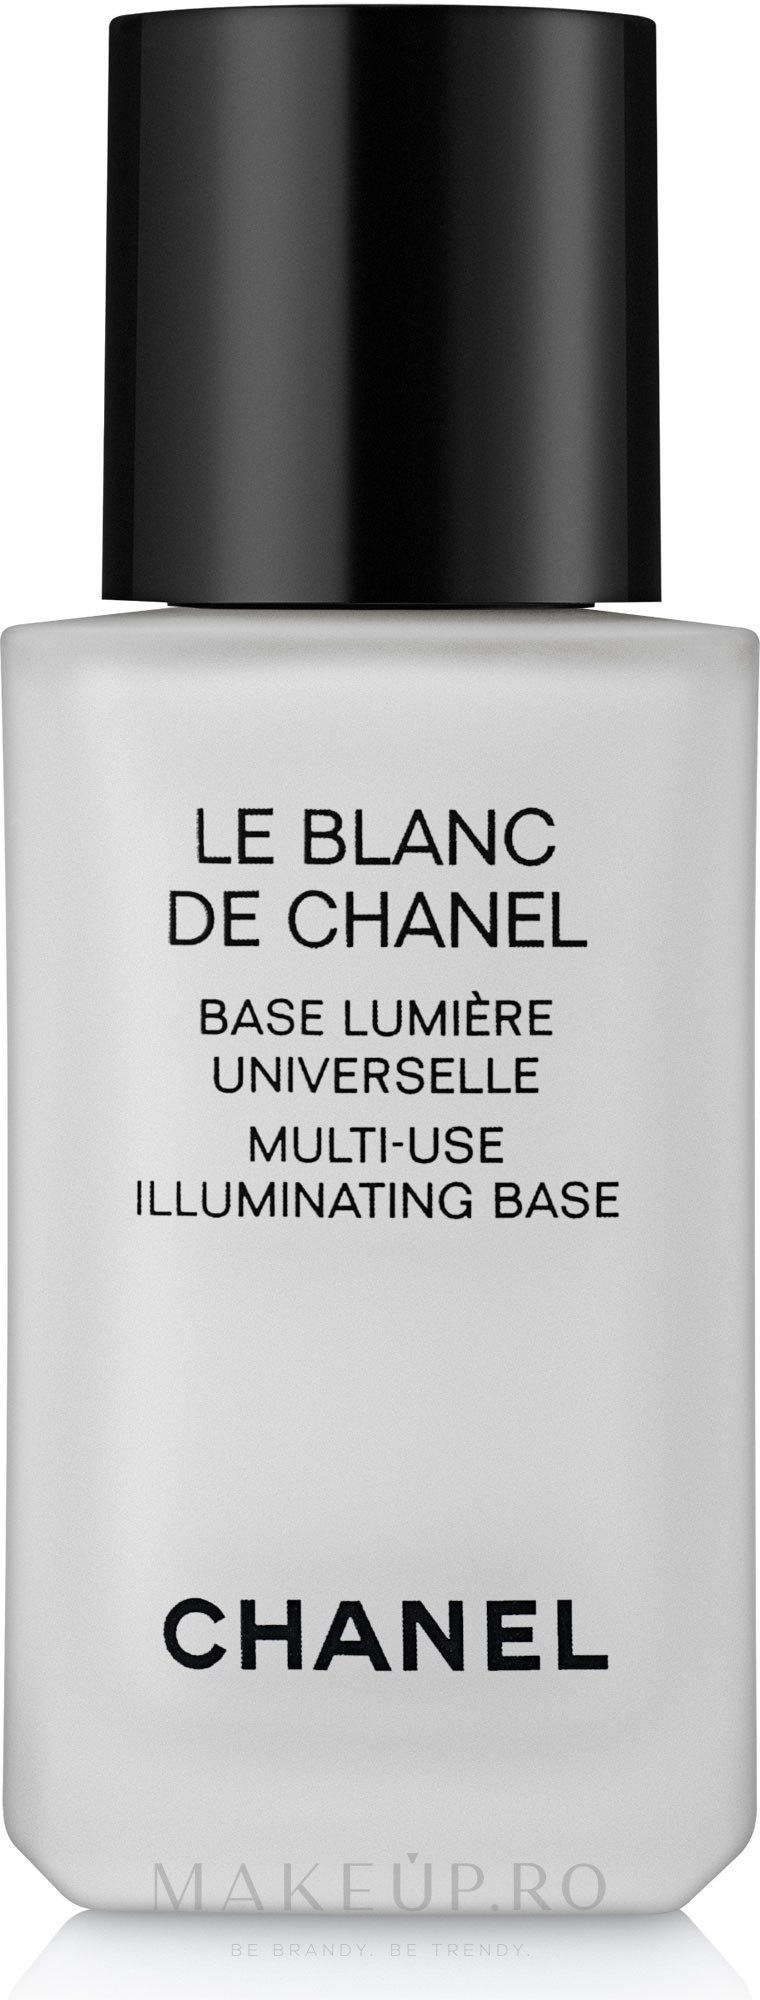 Bază pentru make-up - Chanel Le Blanc de Chanel Multi-Use Illuminating Base — Imagine 30 ml